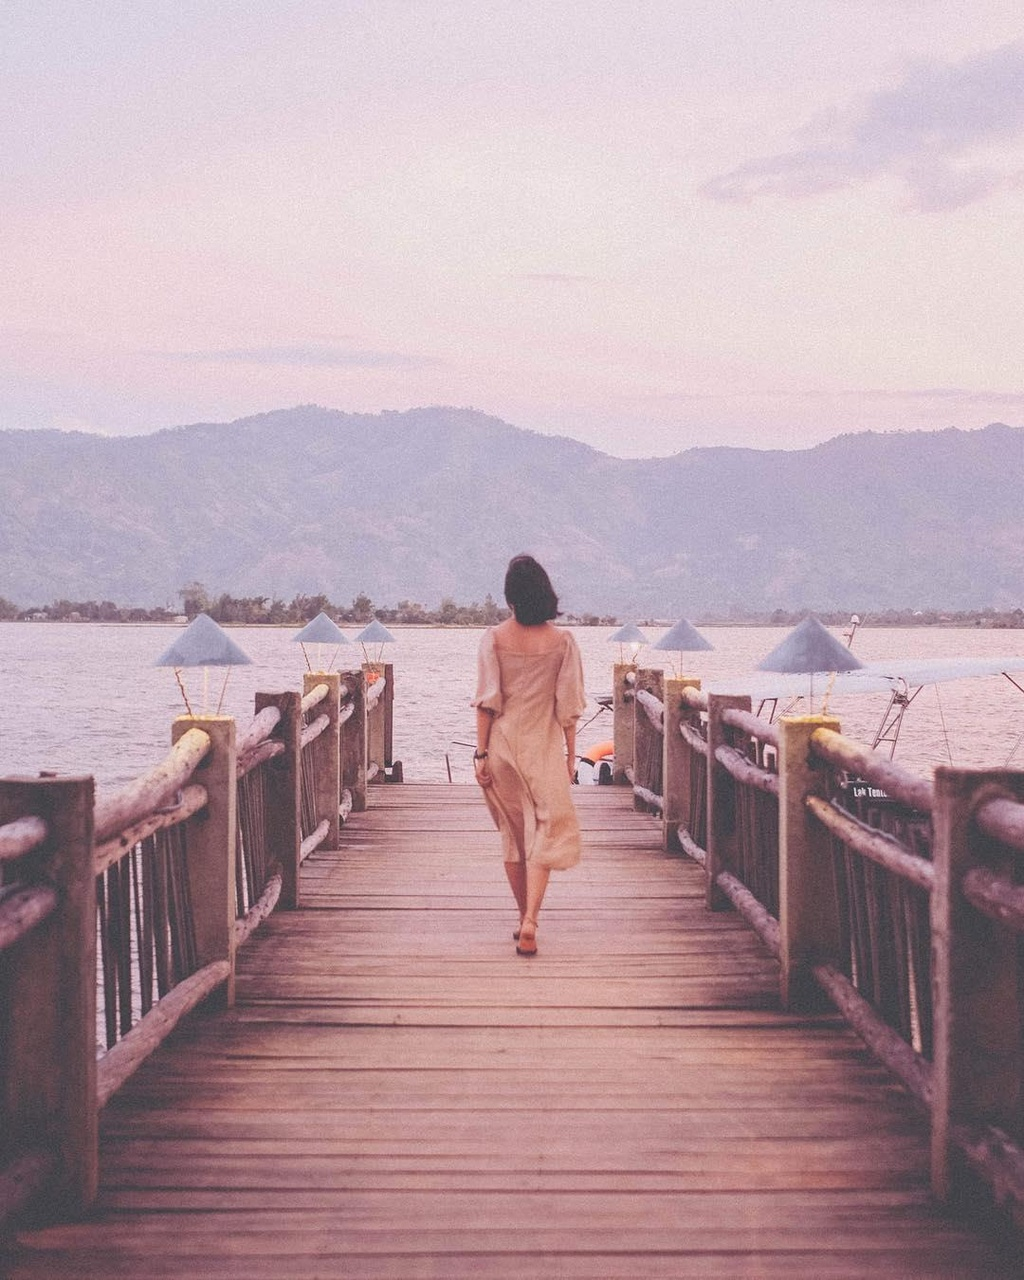 Cam trai kieu 'chanh sa' tai resort giua long rung nui Tay Nguyen hinh anh 12